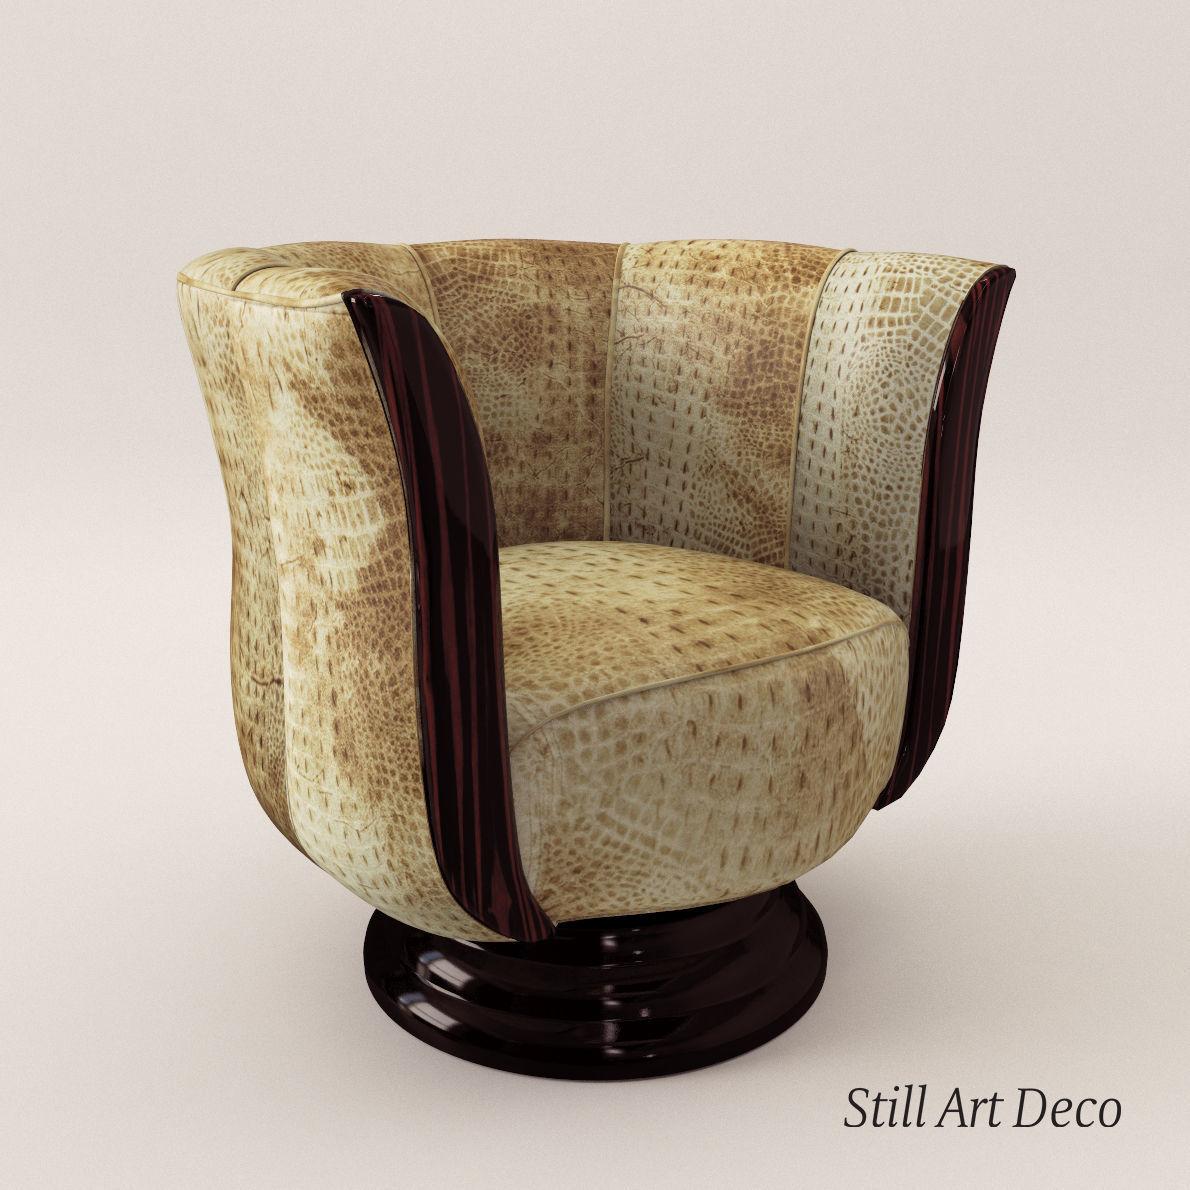 Art Deco Fauteuil.Rotaring Fauteuil Art Deco Style 3d Model